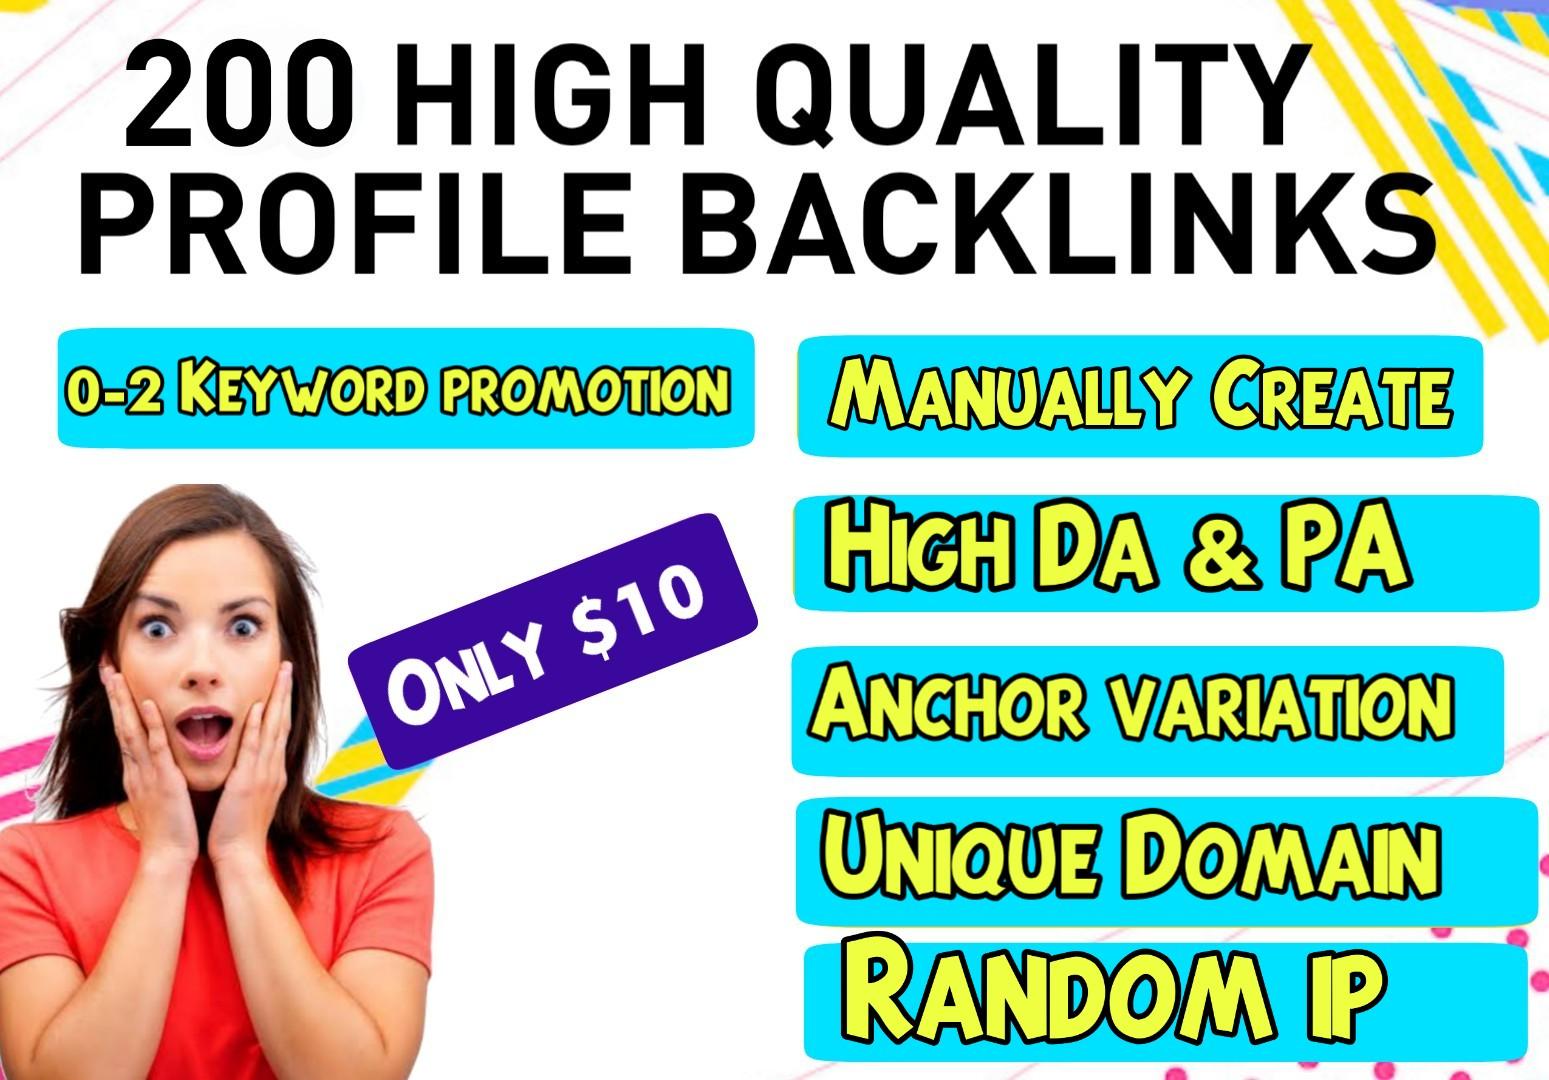 Manually 200 Do-follow Profile backlinks with High DA & PA for website SEO